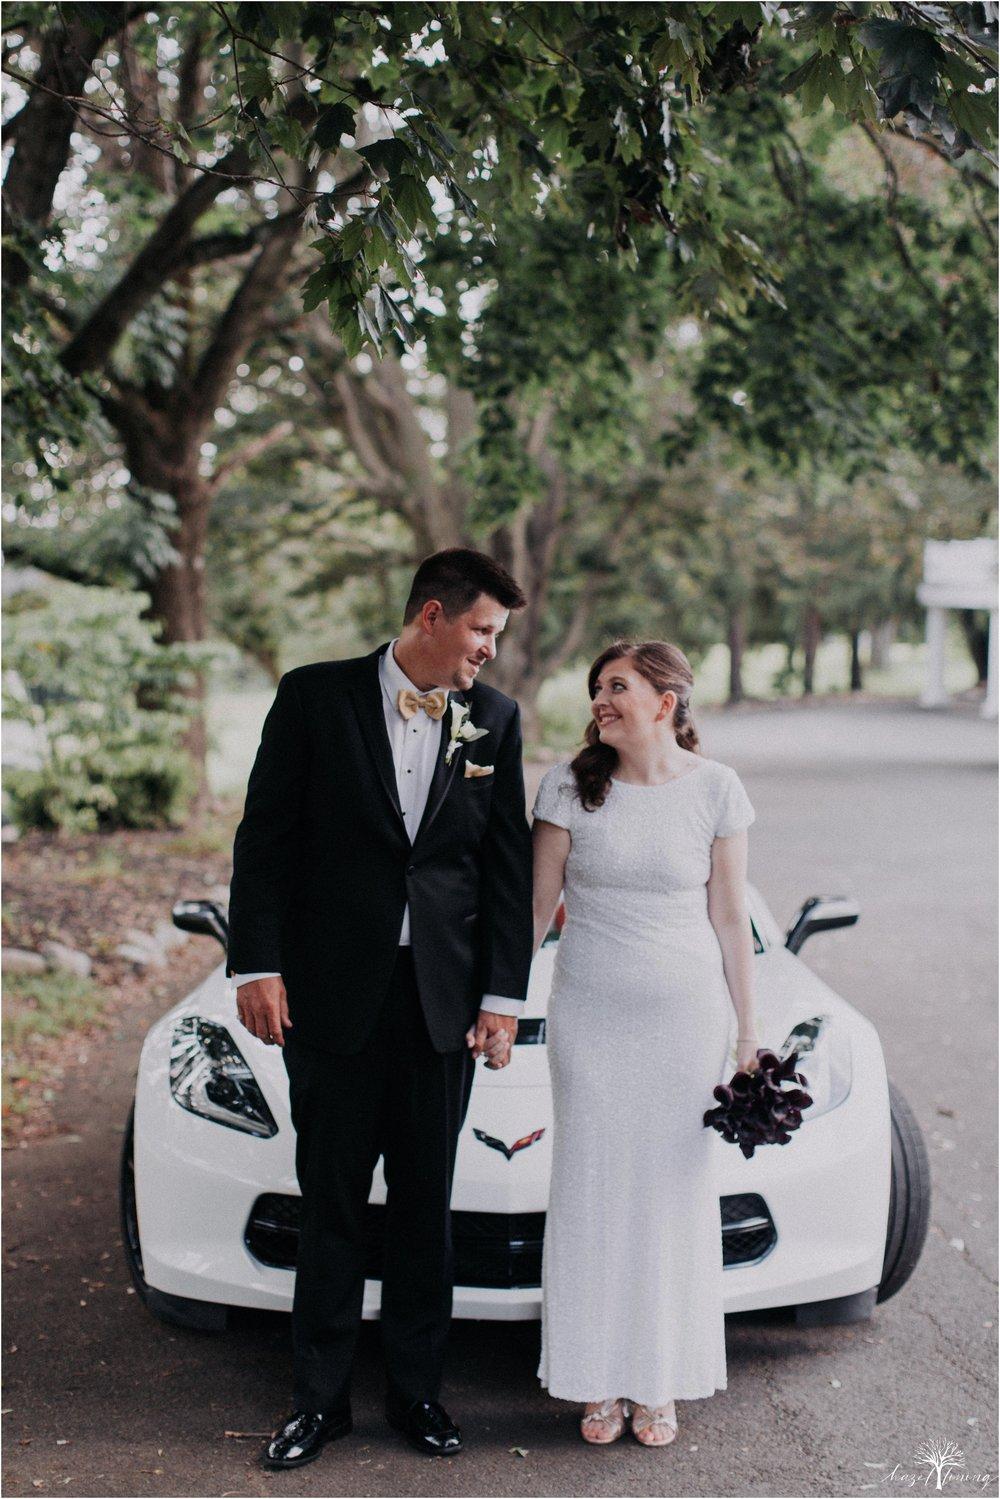 elizabeth-doelp-andrew-foreback-middletown-country-club-summer-langhorne-pennsylvania-wedding-hazel-lining-travel-wedding-elopement-photography_0085.jpg